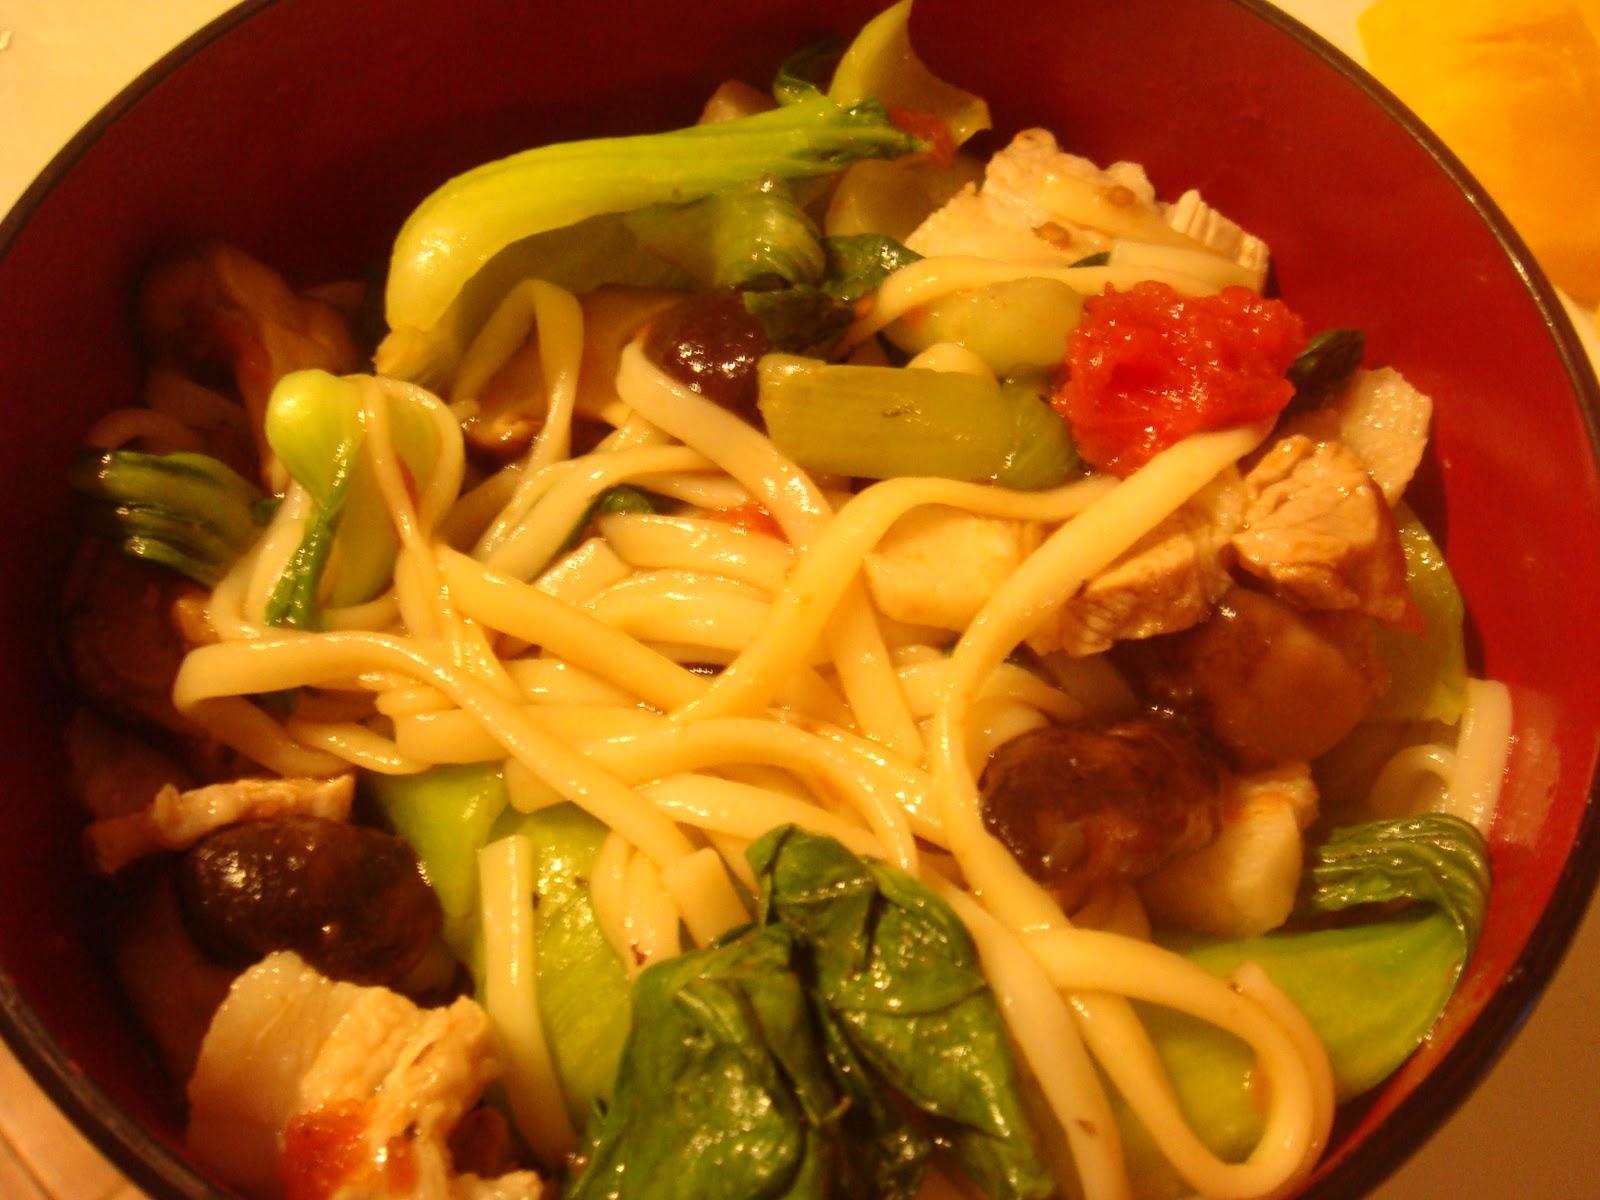 [Hattori Heiji] Thám tử đến từ miền Tây - Page 8 Udon+noodle+2